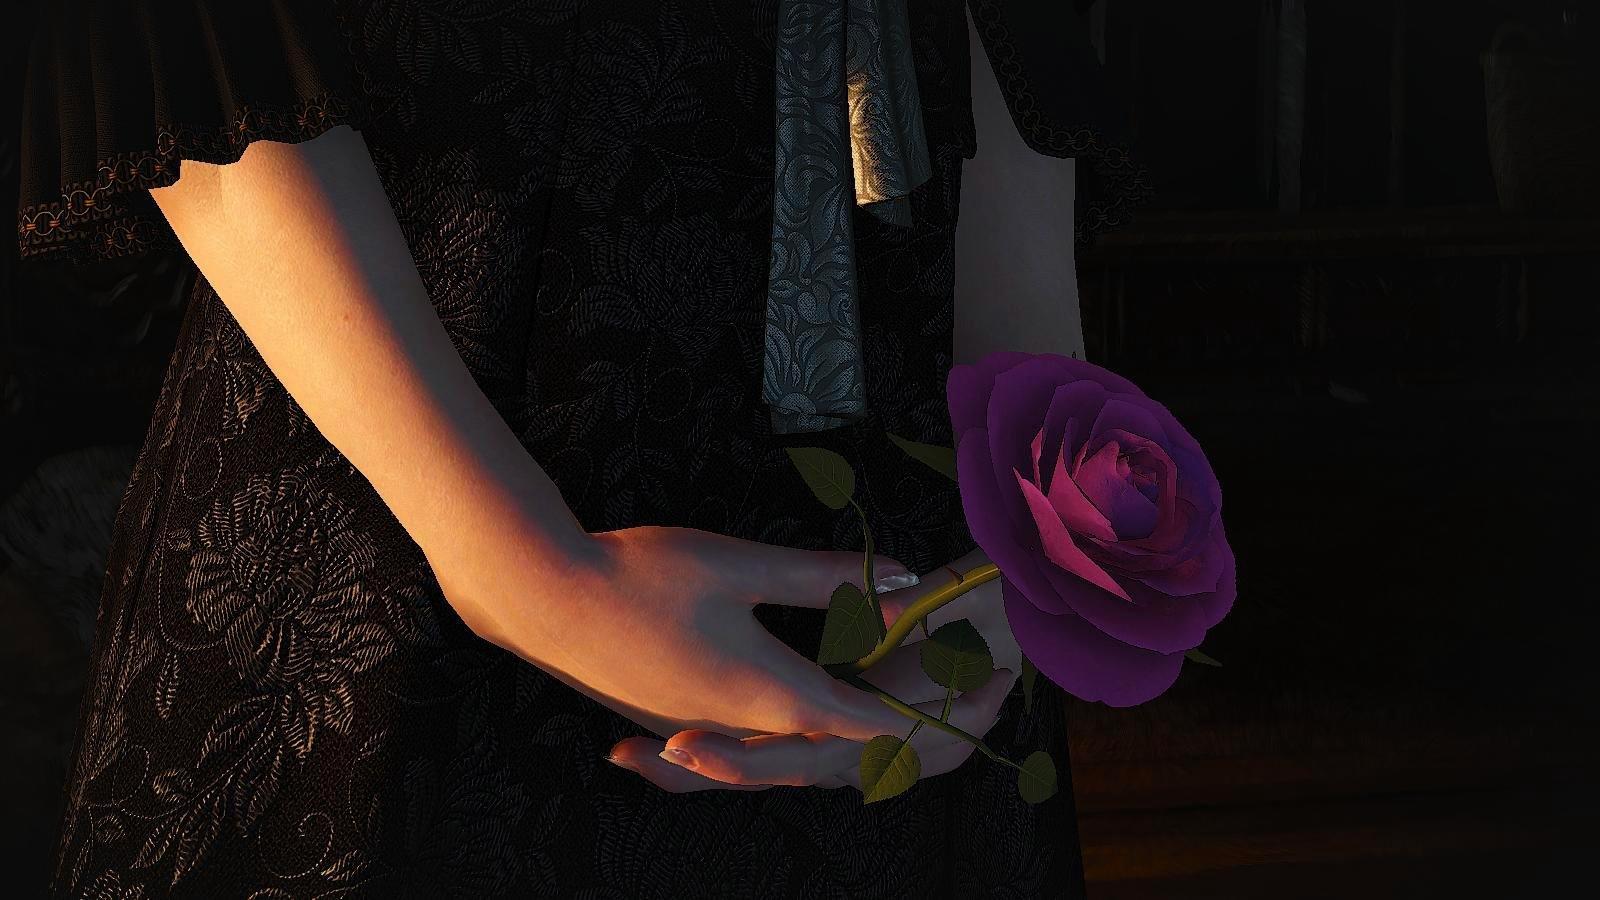 Роза - символ памяти и любви.. ВЕДЬМАК III (сборка Торна)